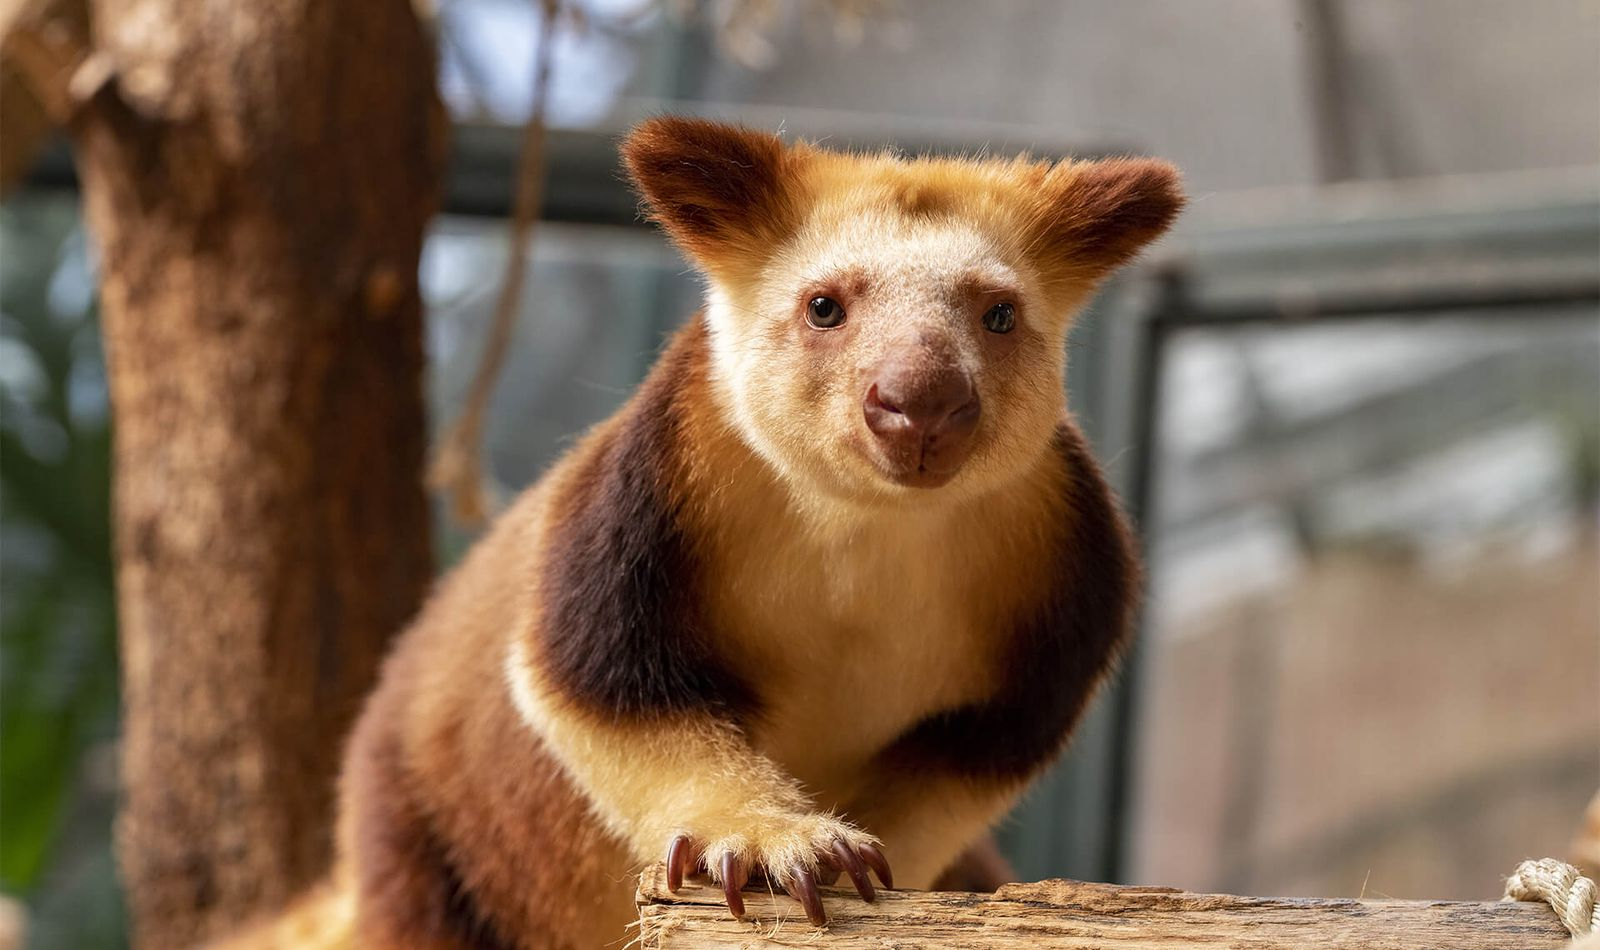 Dendrolague de Goodfellow - Offrir un cadeau à vos proches - ZooParc de Beauval